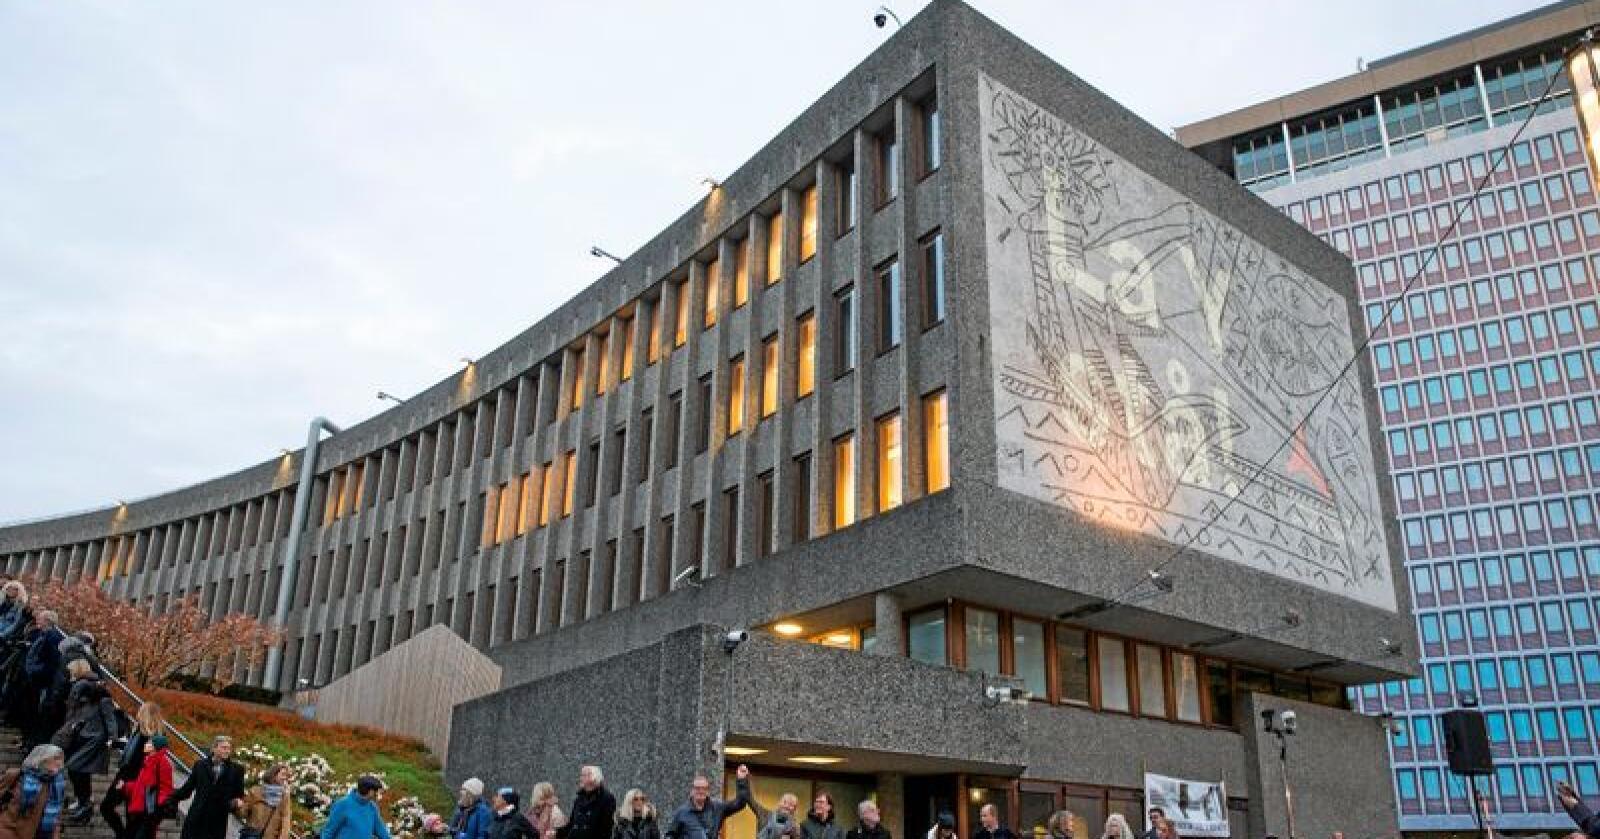 Picasso: Den kjente kunstneren Pablo Picasso har utsmykket Y-blokka i Oslo. Foto: Håkon Mosvold Larsen / NTB scanpix